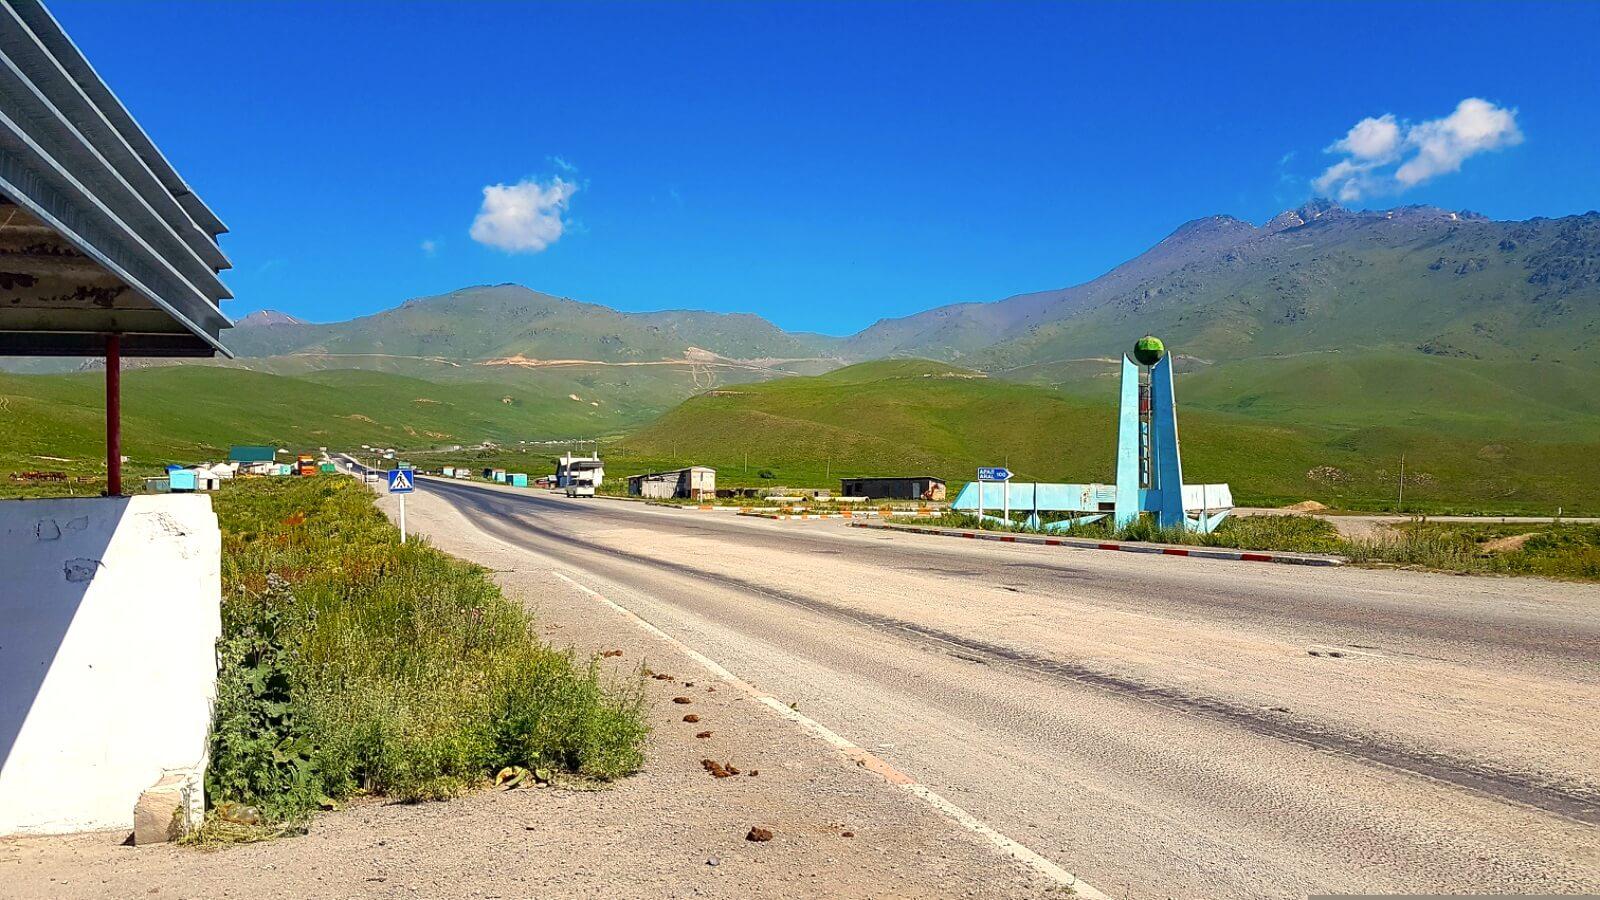 Kirgistan - ein unentdecktes Land voller Berge cover image